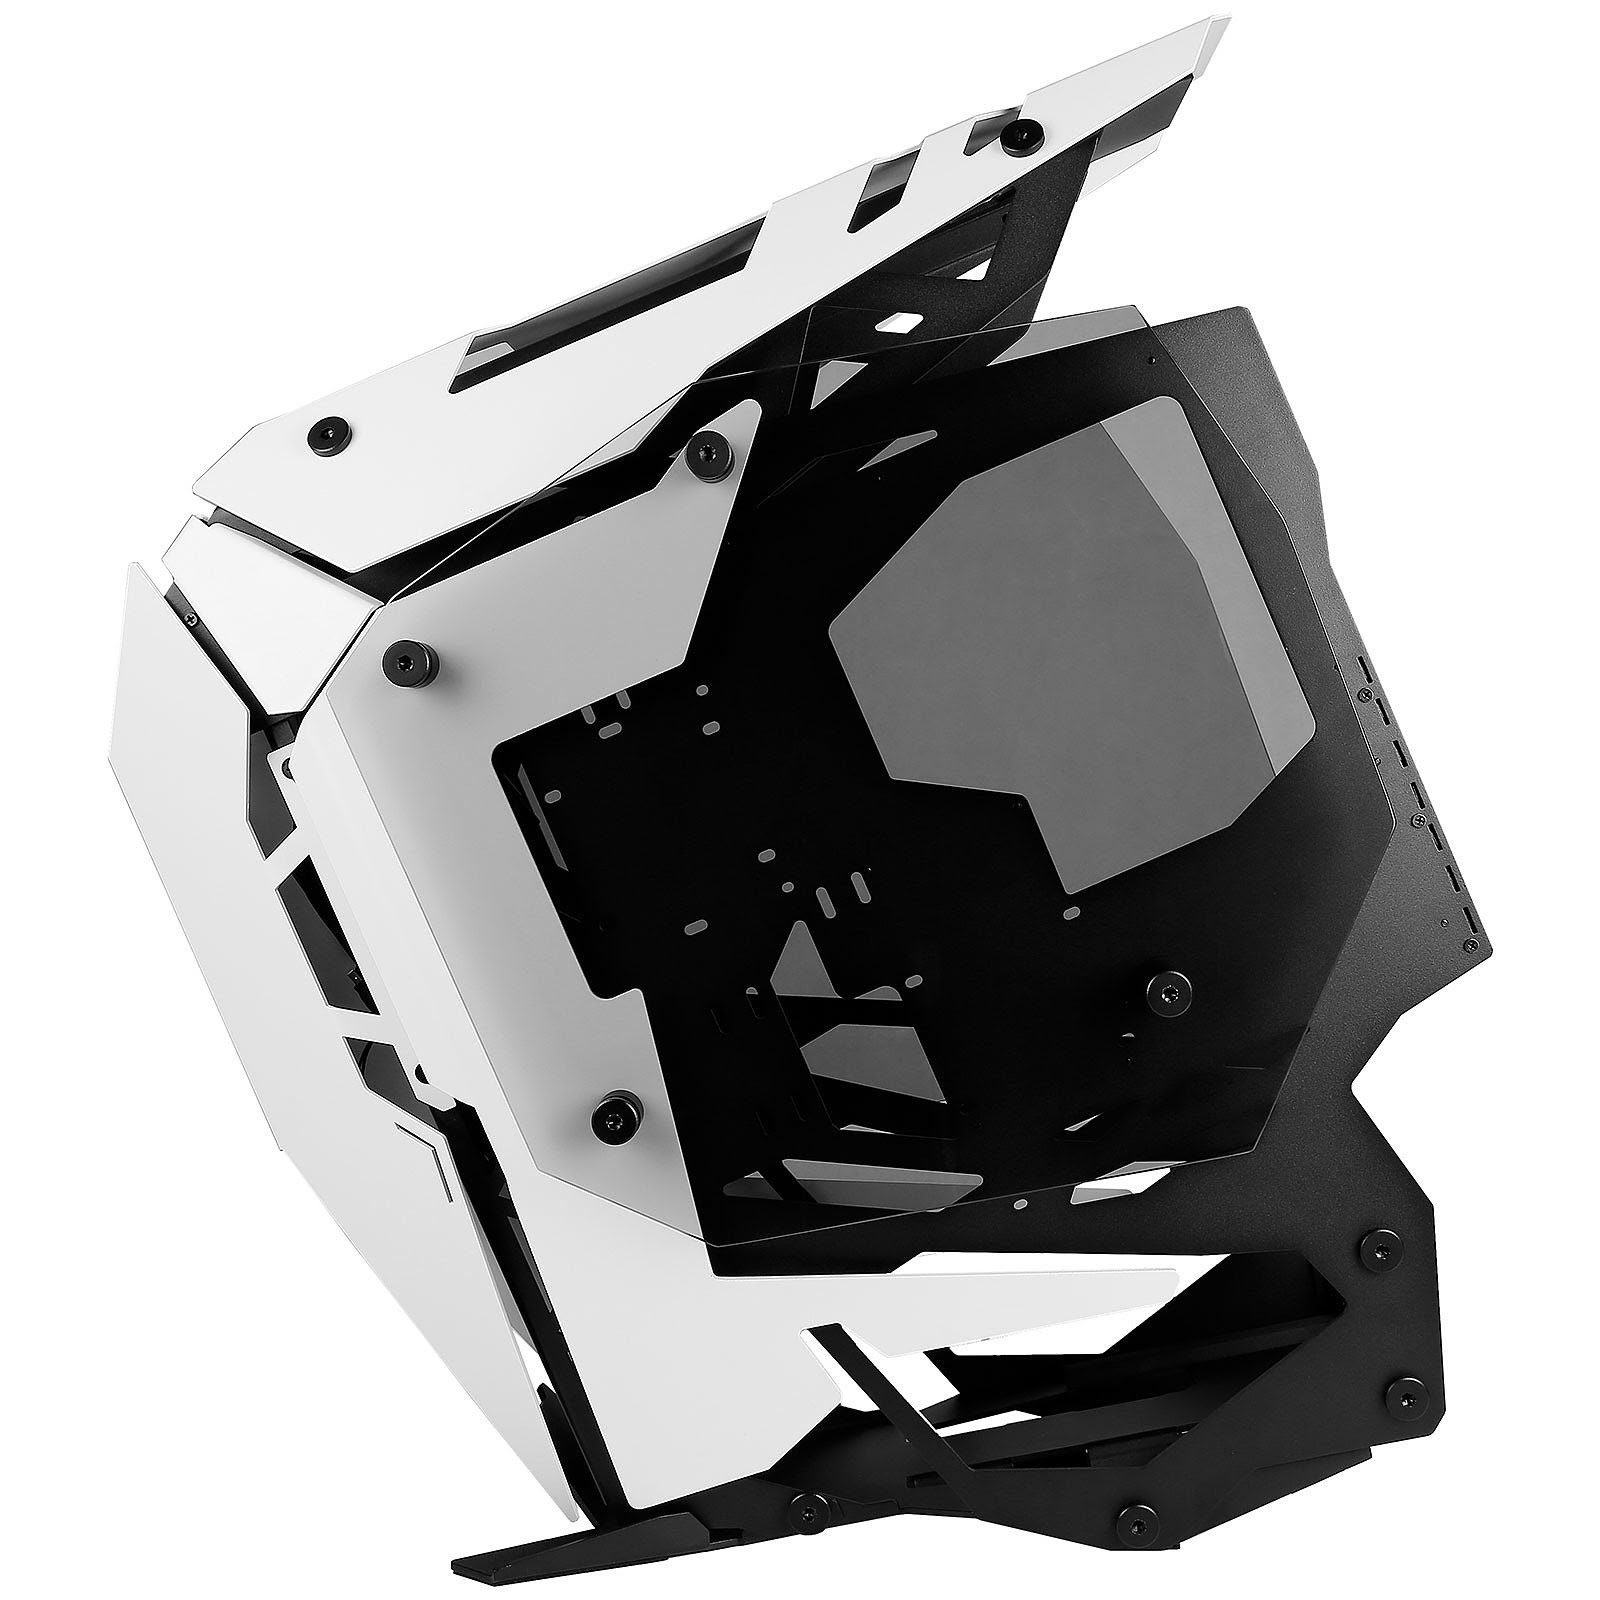 Antec TORQUE Black/White Blanc - Boîtier PC Antec - Cybertek.fr - 3